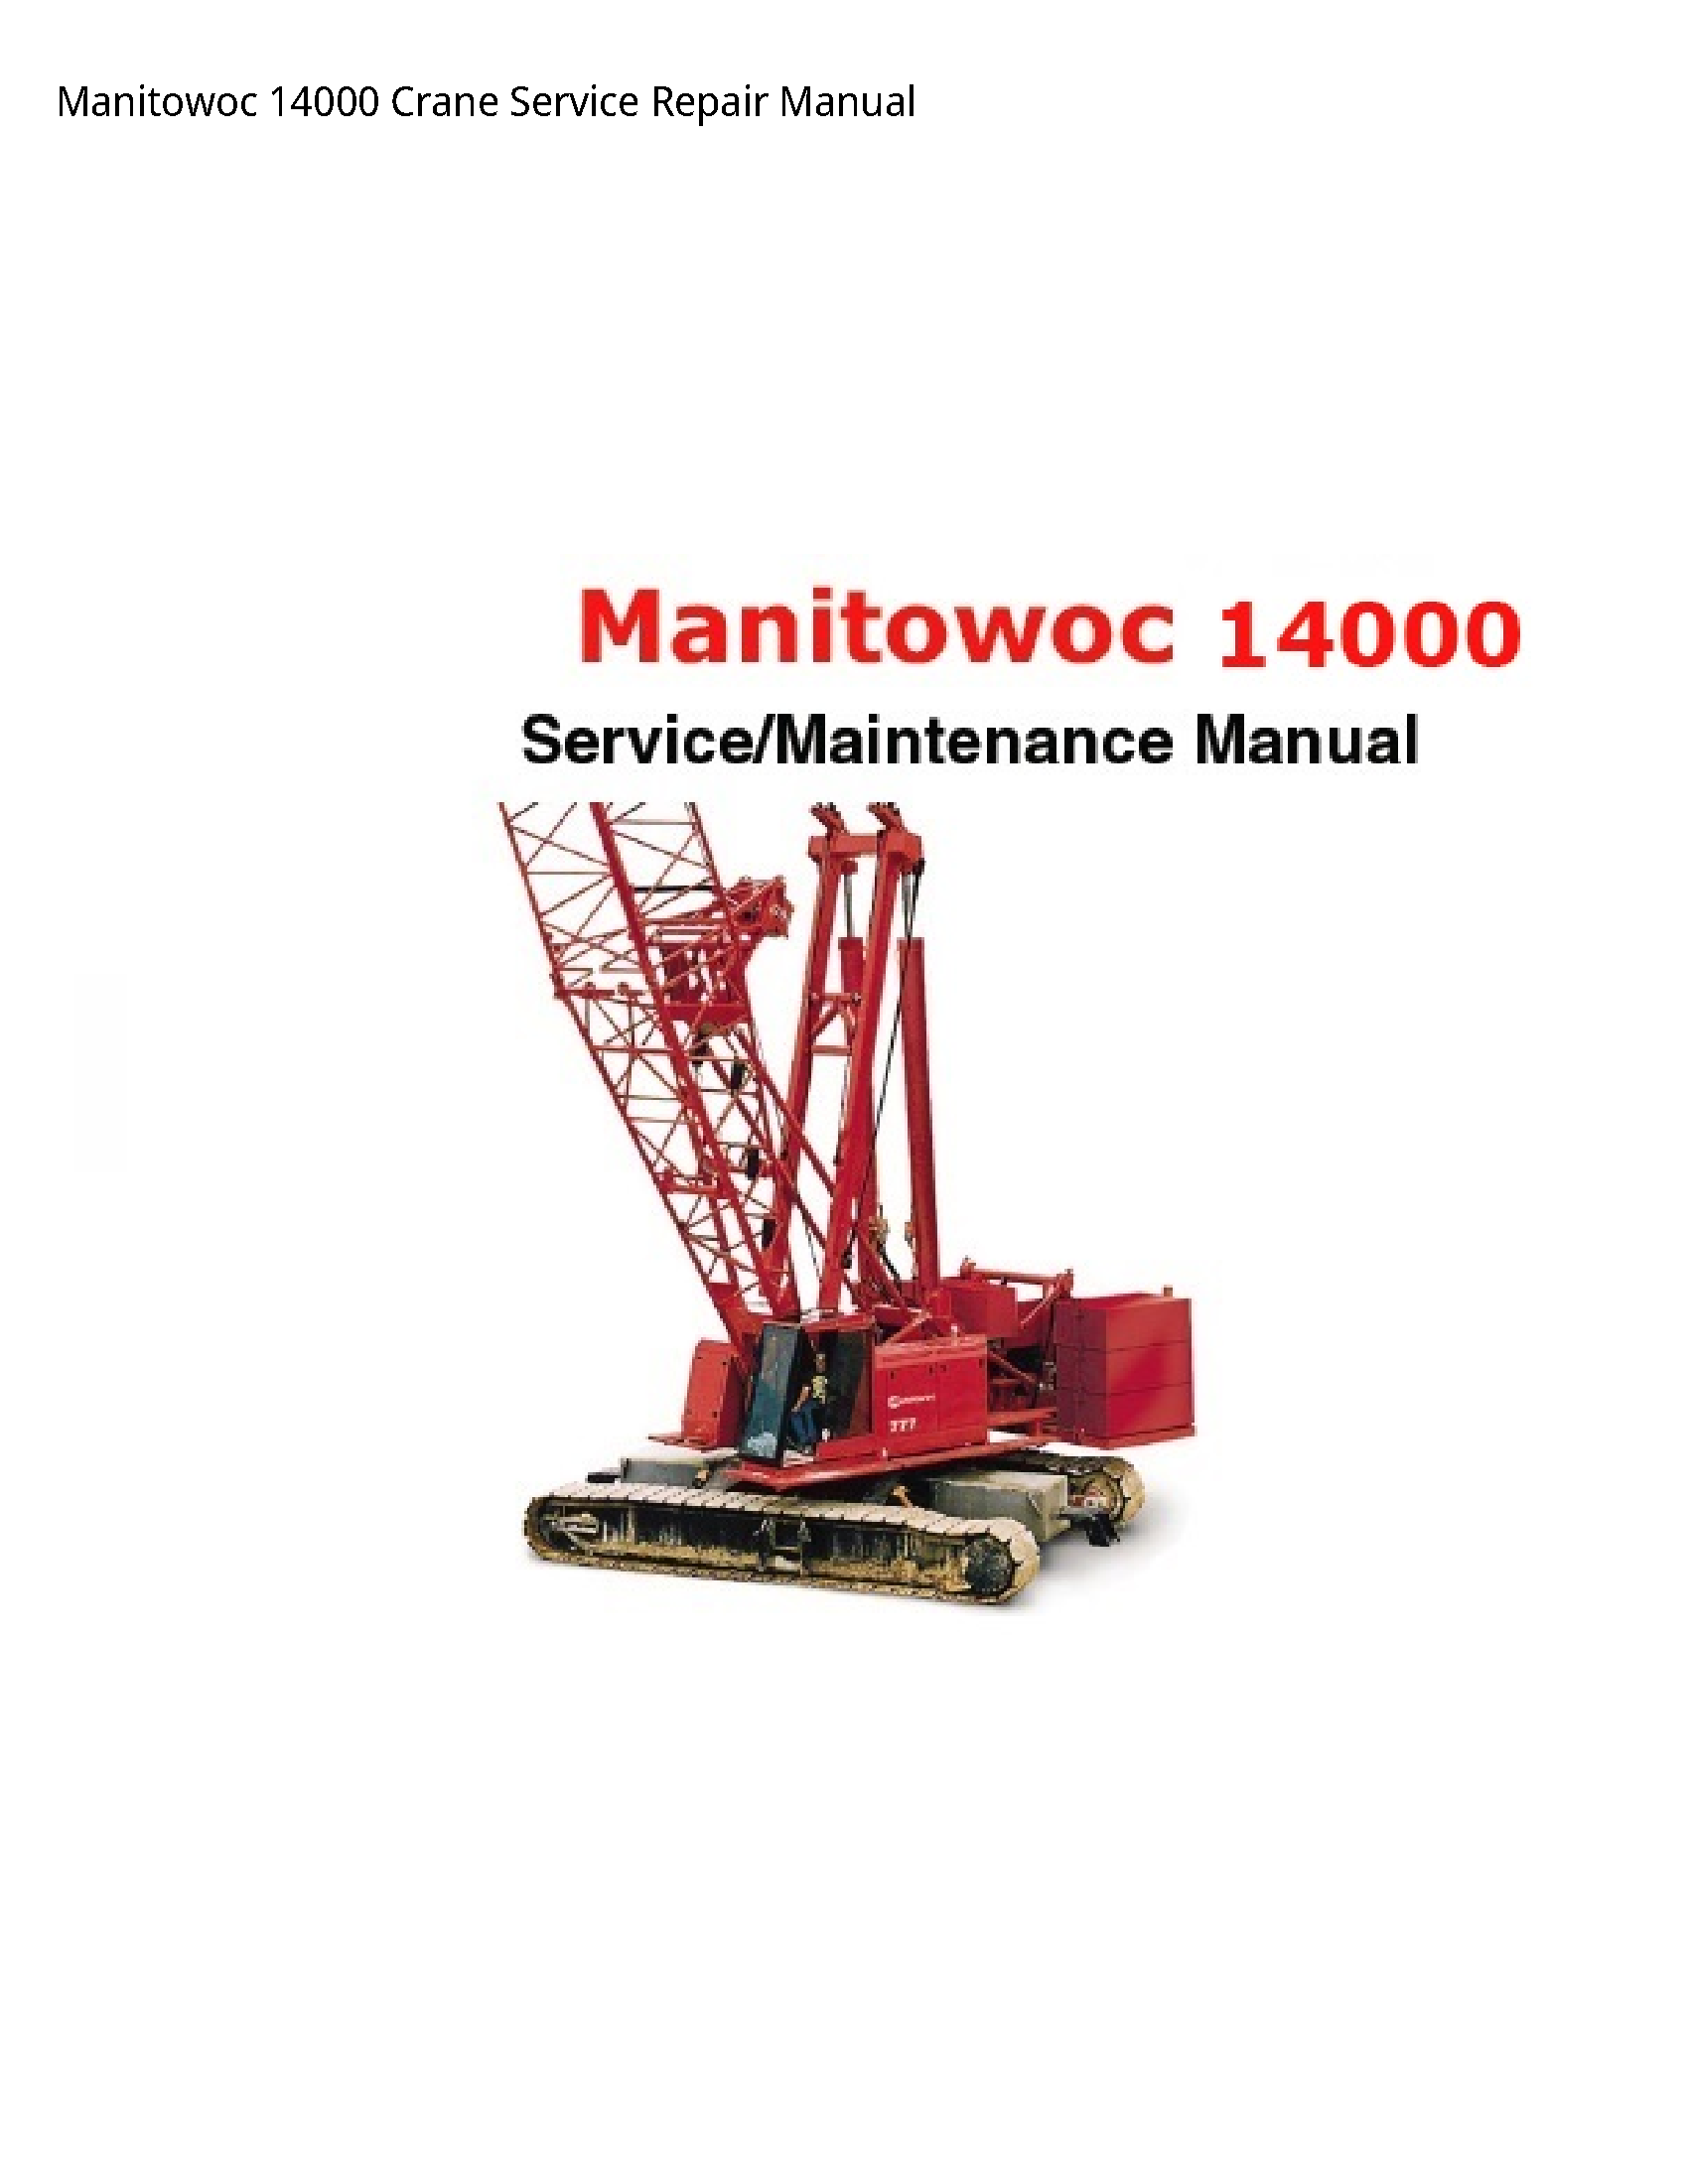 Manitowoc 14000 Crane manual